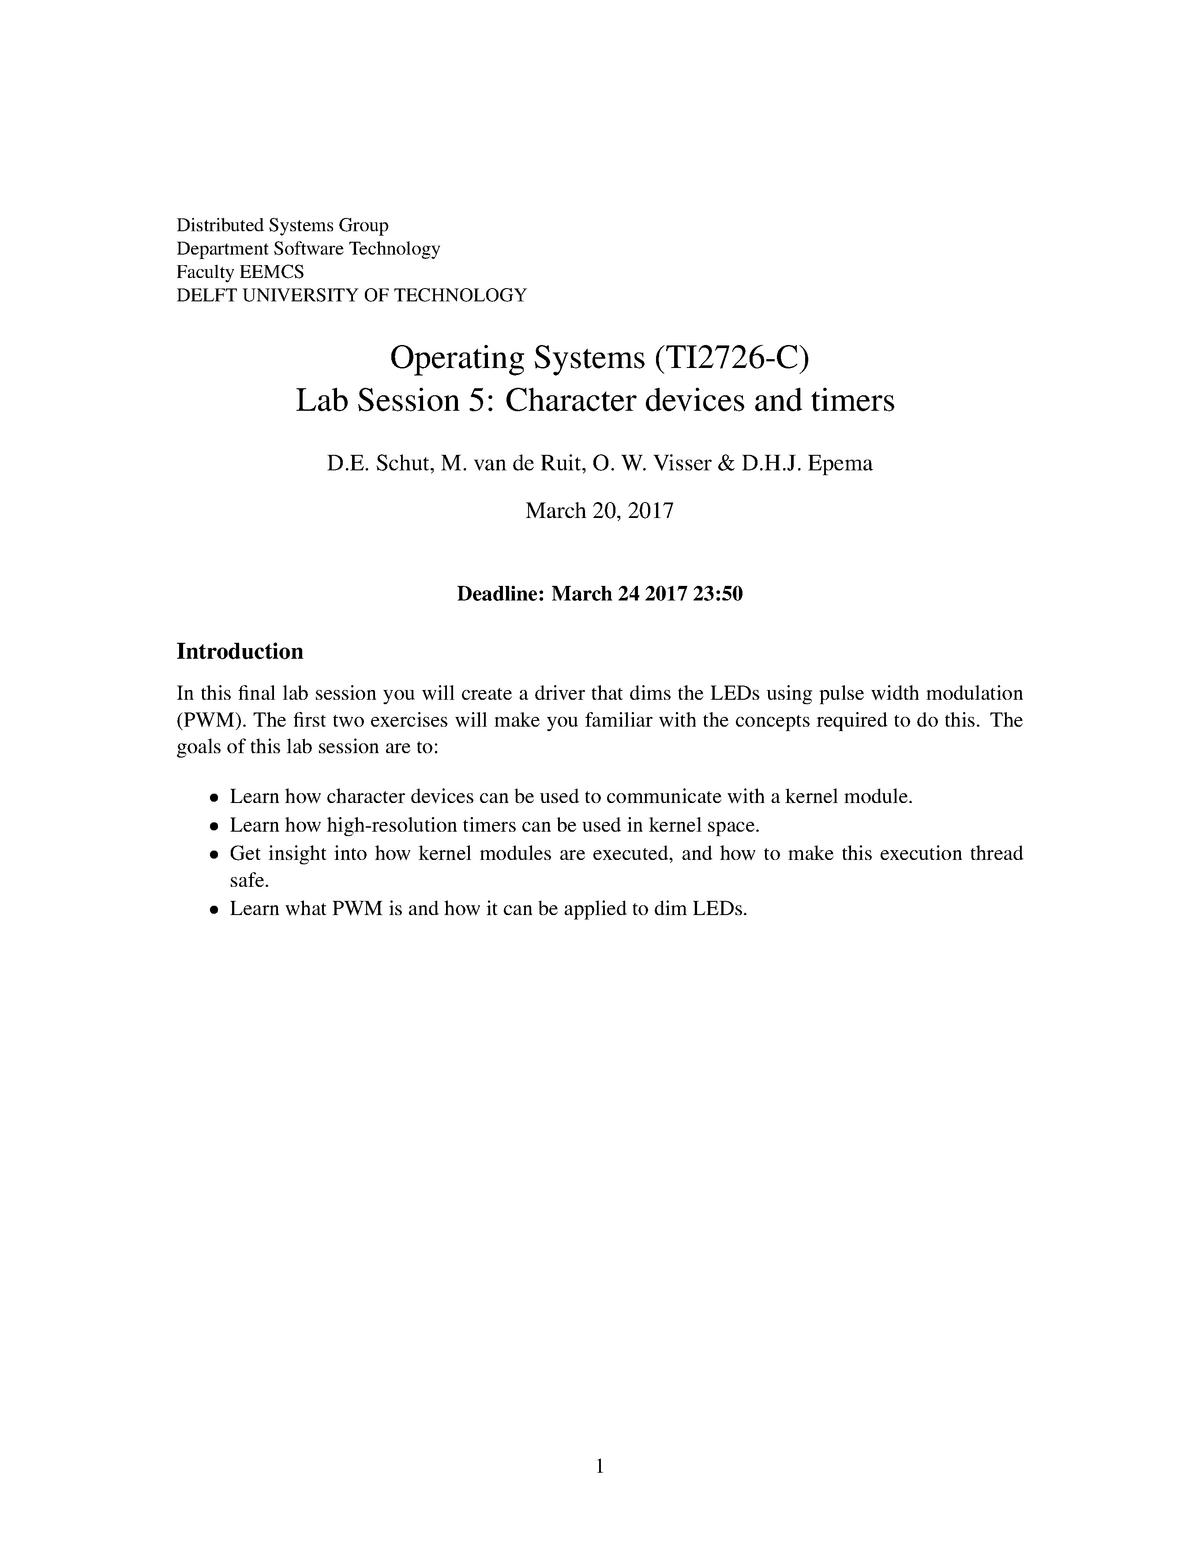 TI2726C-lab-assignment 5 - TI2726-C: Operating Systems - StuDocu